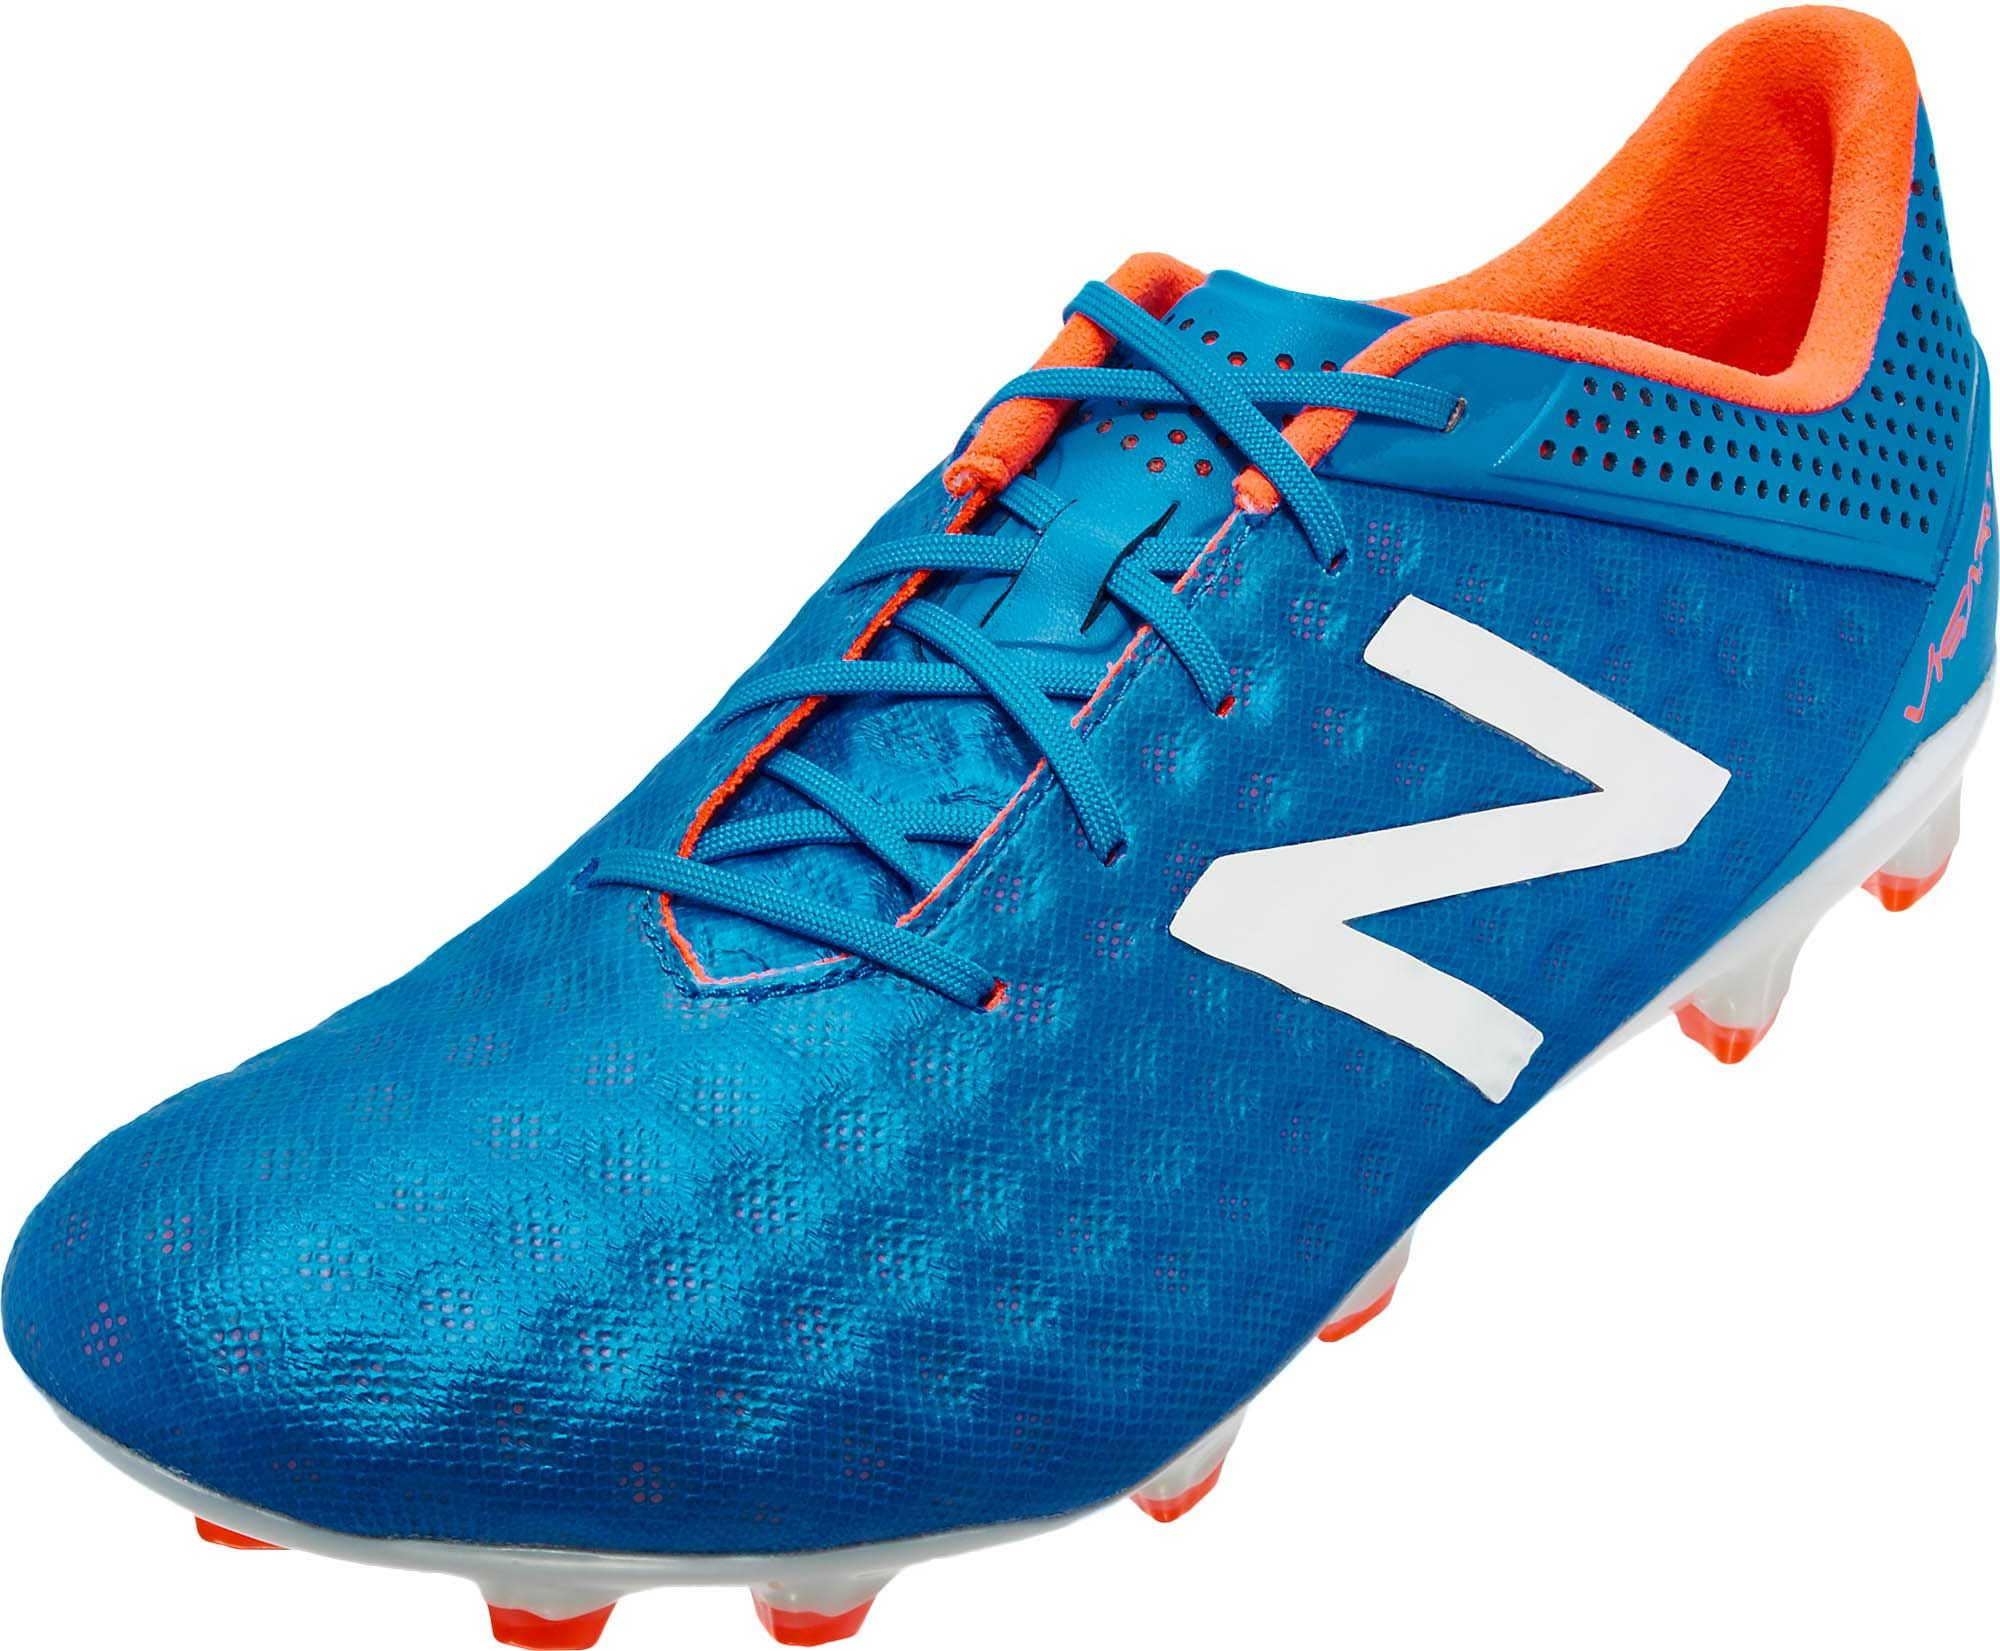 New balance visaro cleats blue new balance soccer shoes